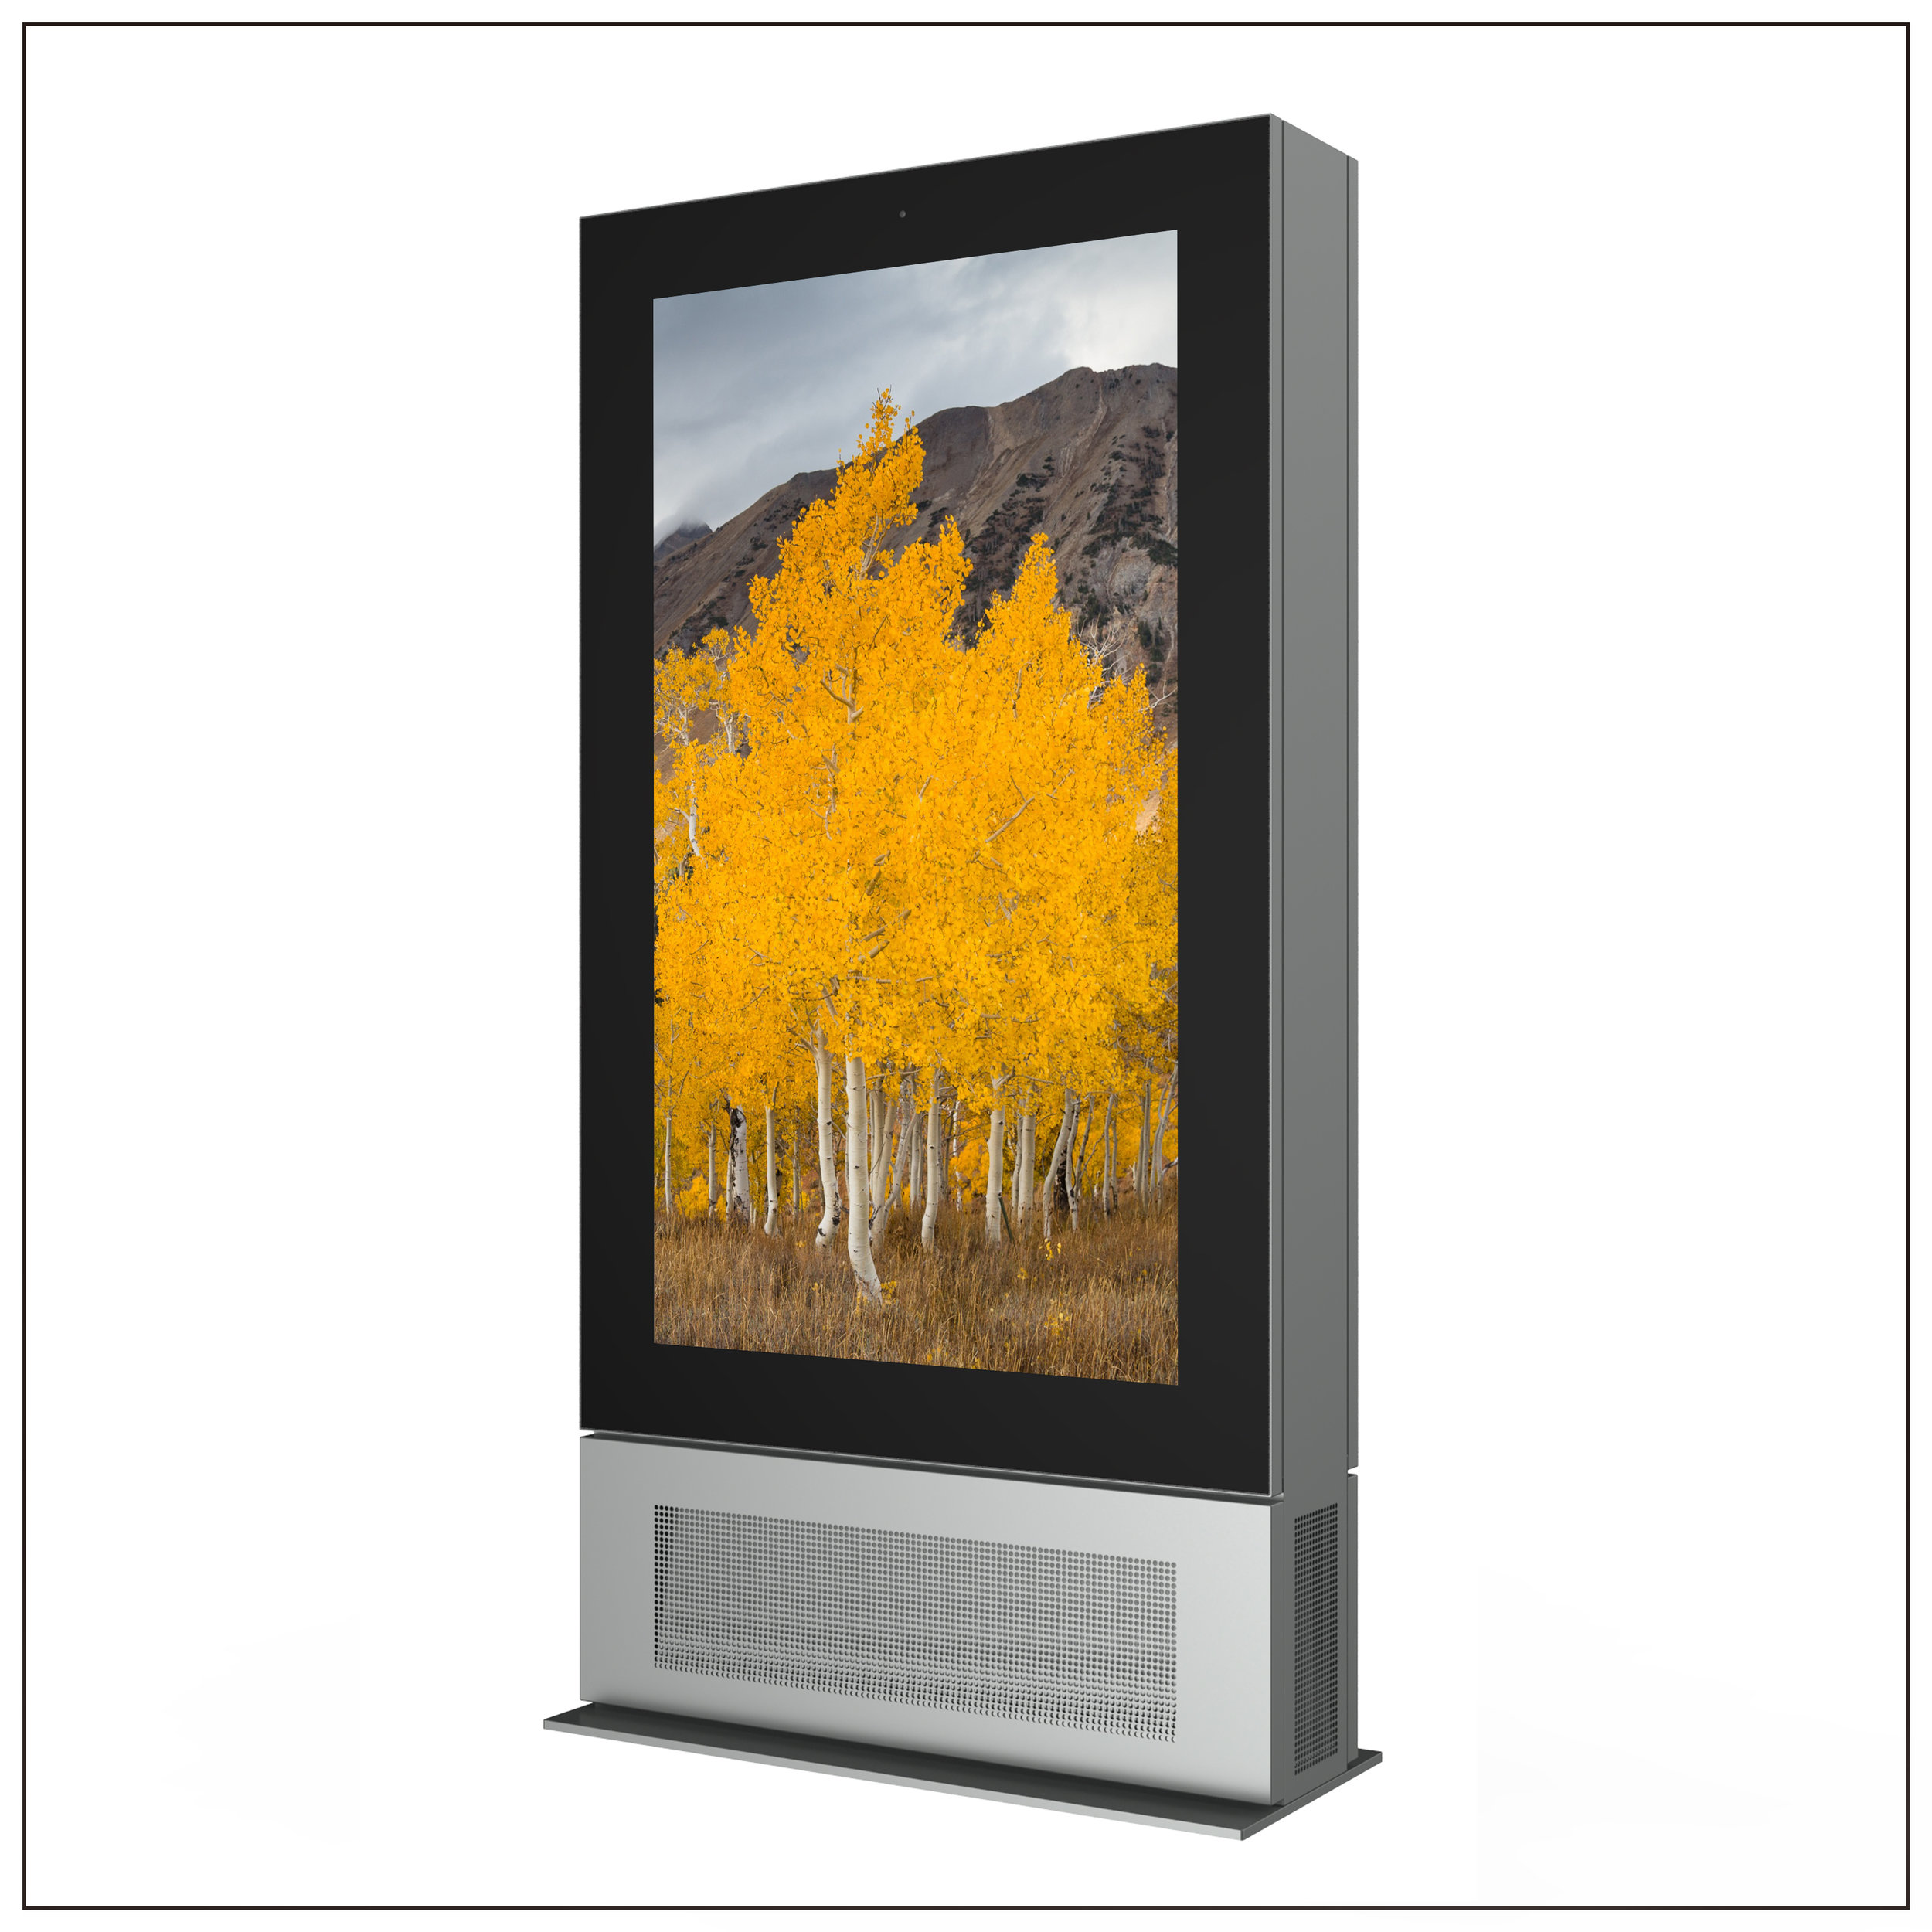 75 inch Liquid Cooled High Brightness LCD Displays